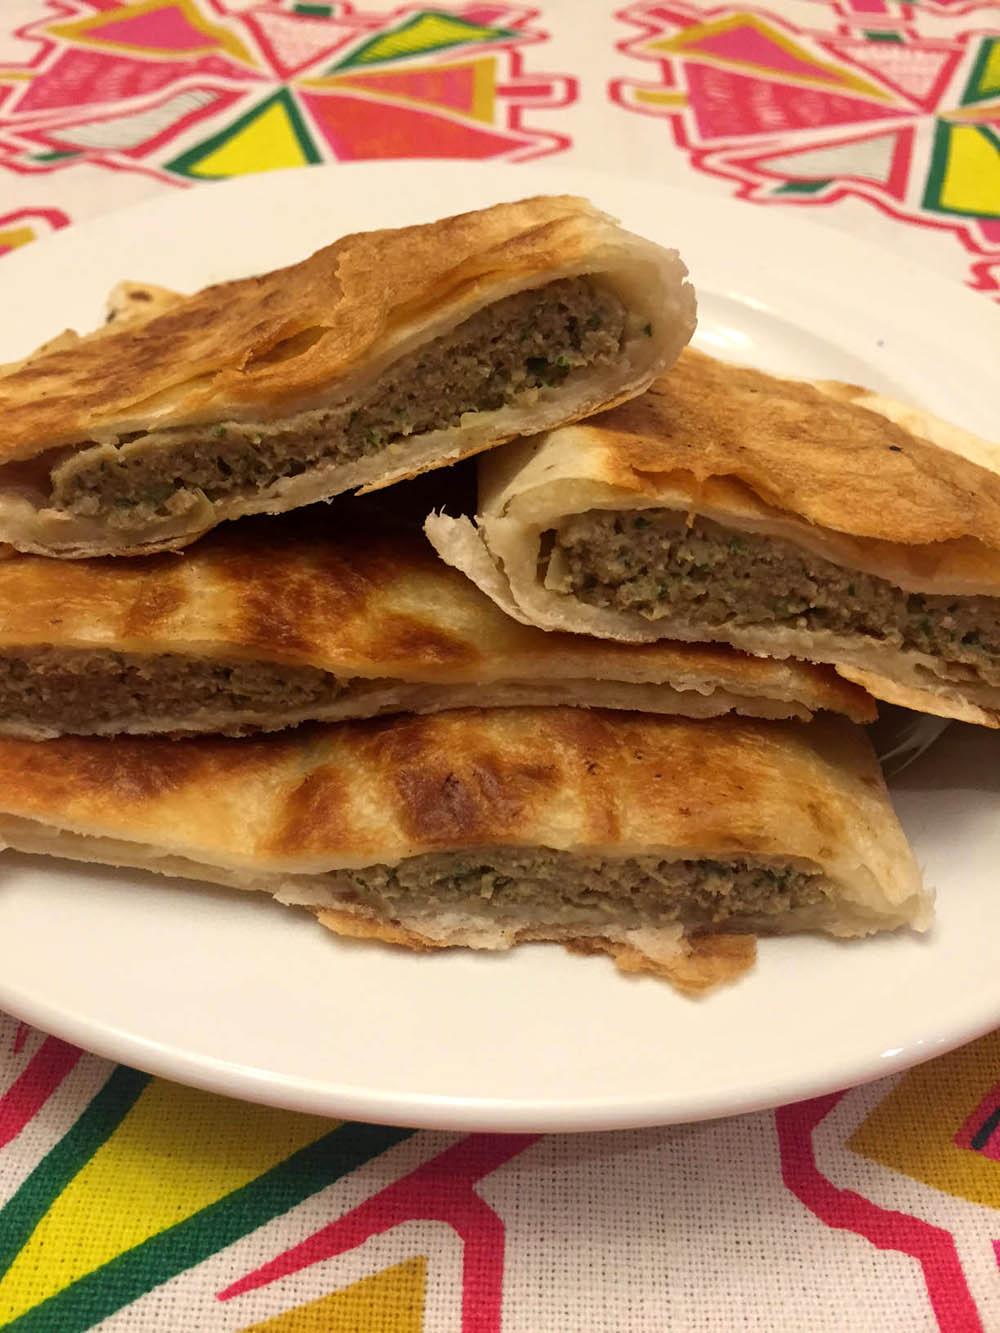 Russian Chebureki Recipe - How To Make Ground Beef Turnovers